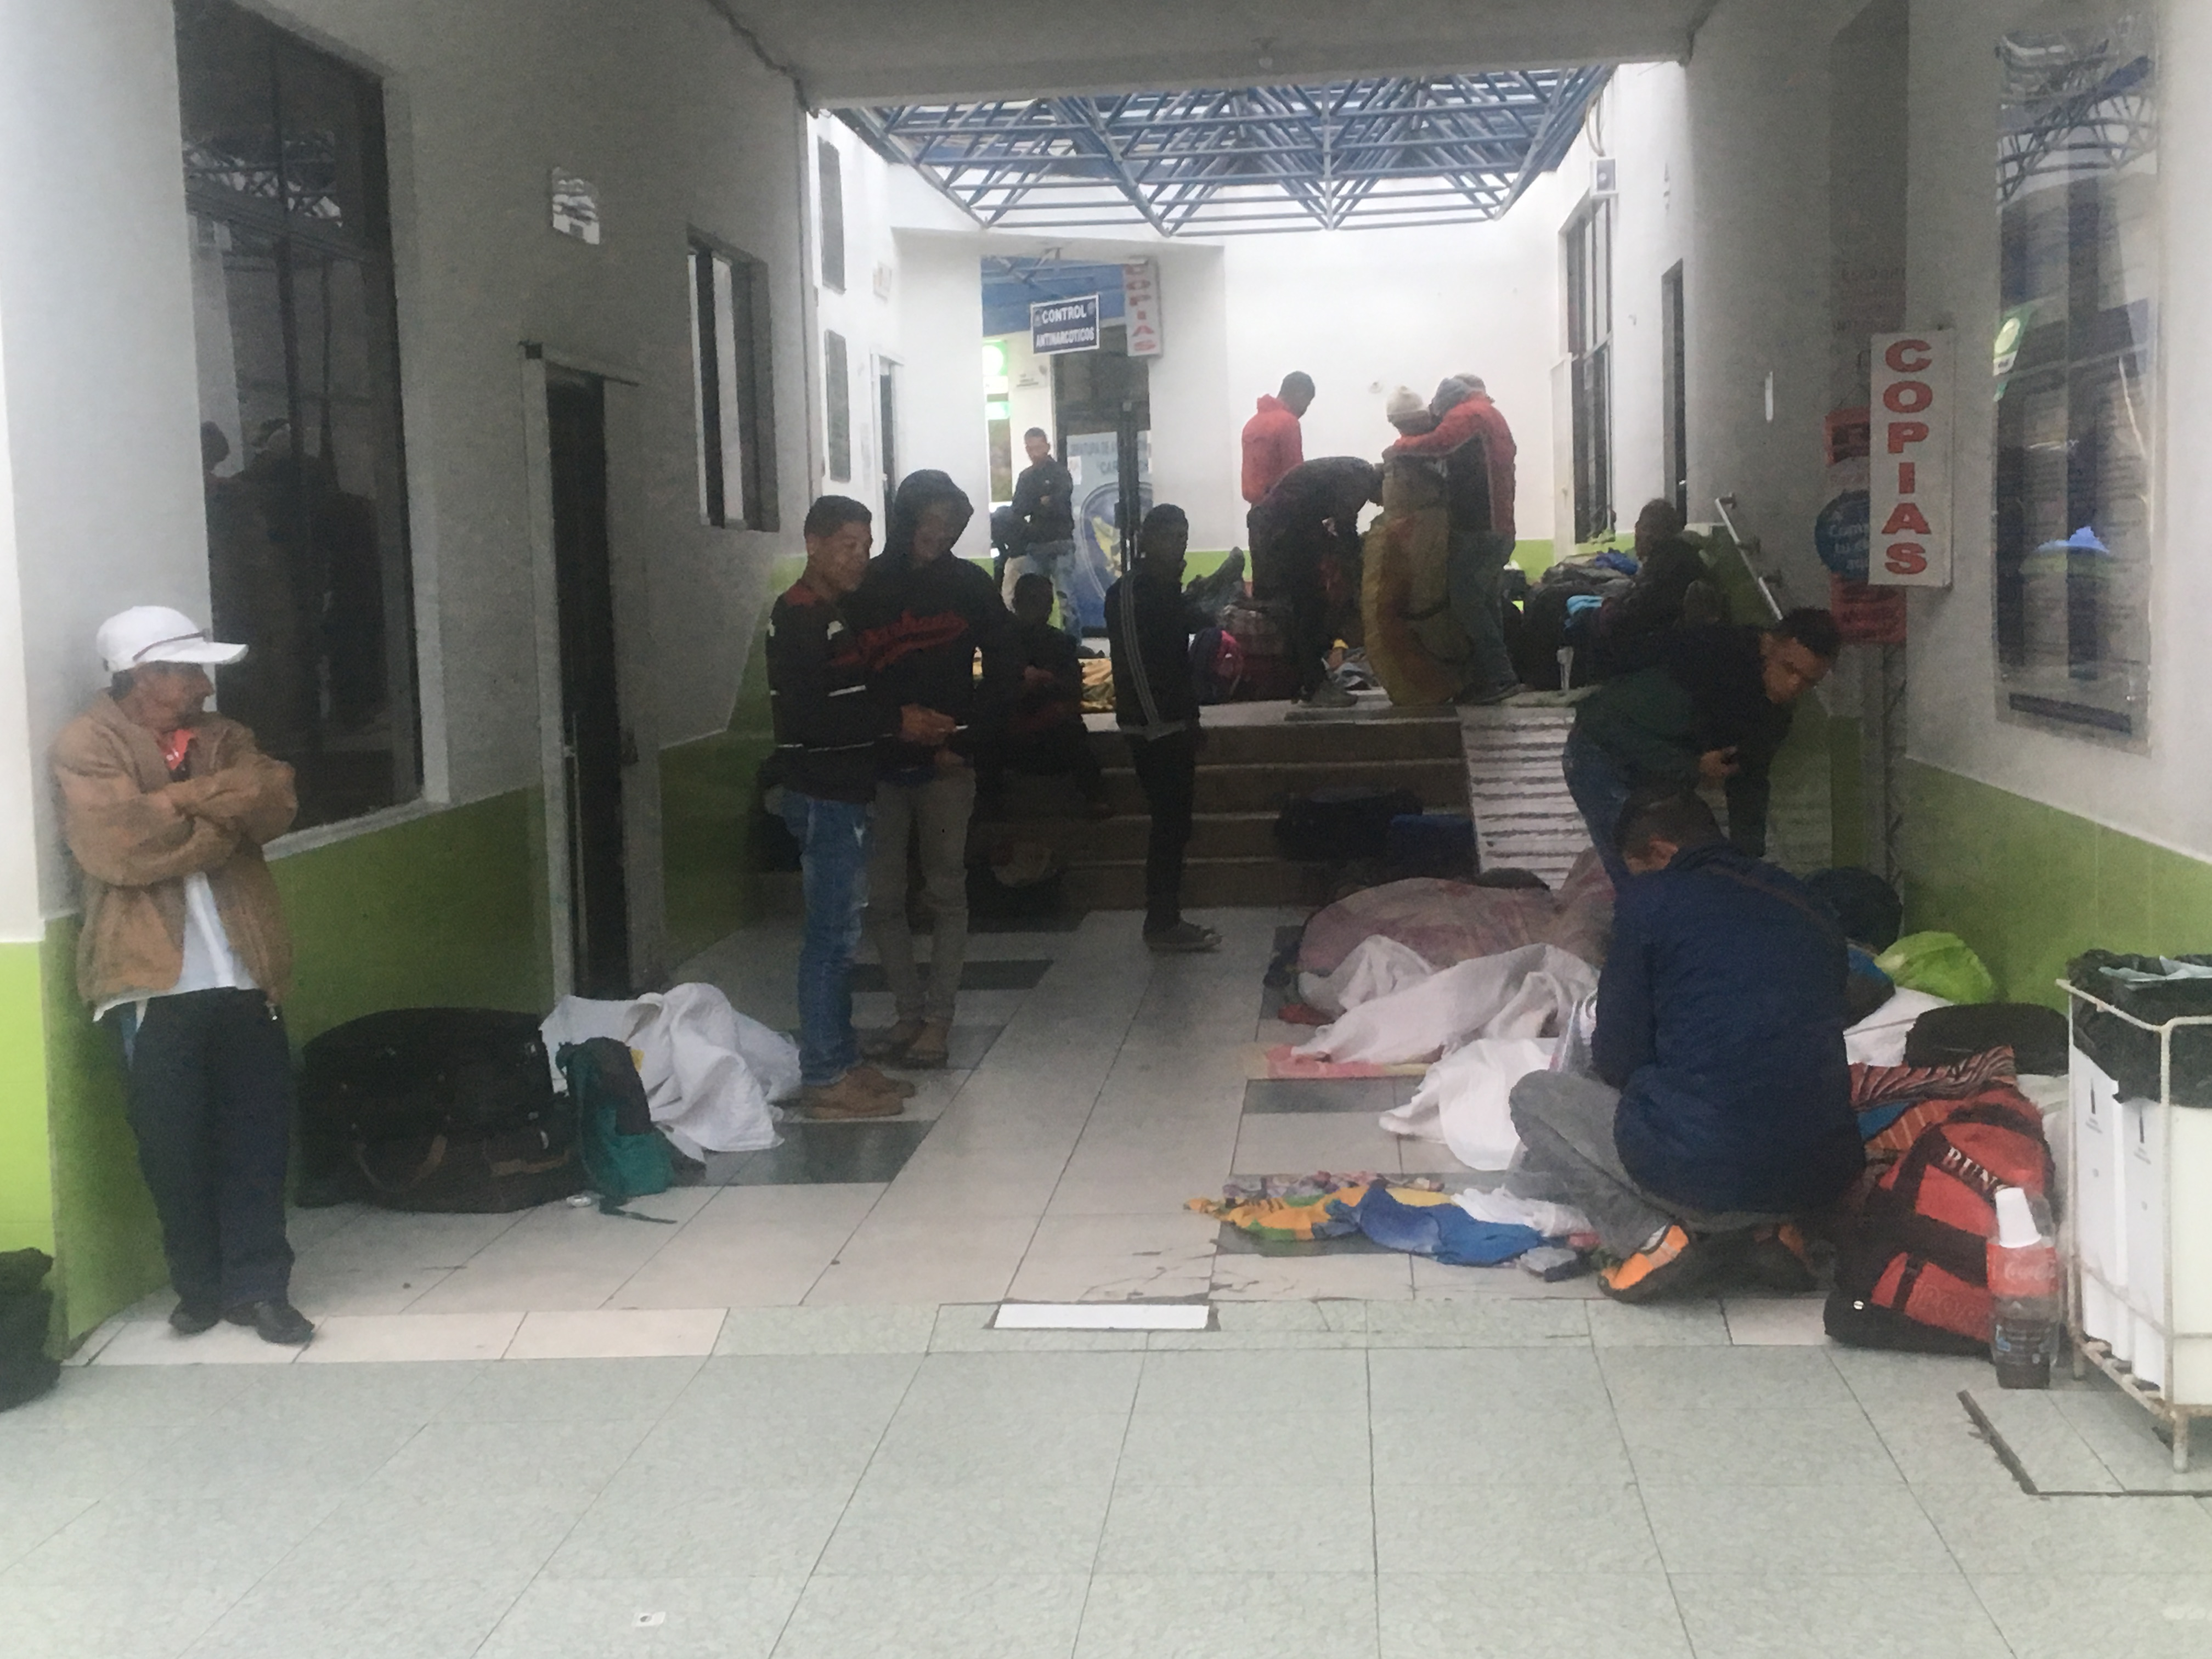 венесуэльские беженцы